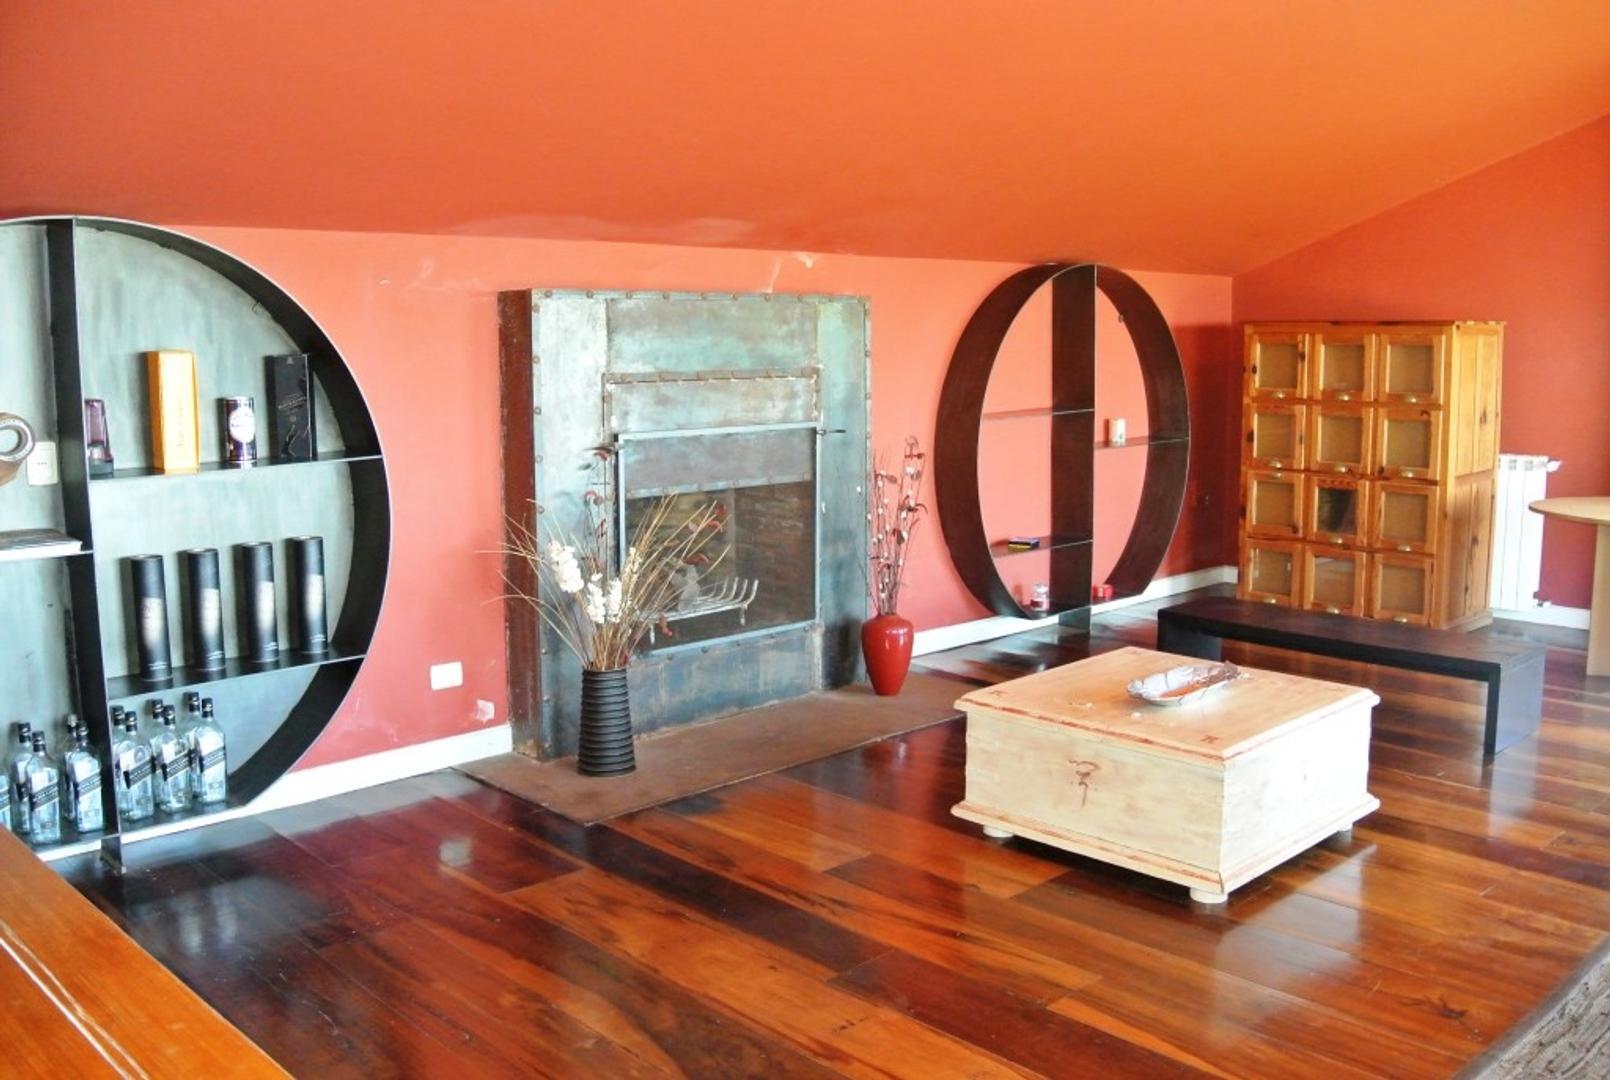 Casa en Alquiler Por Temporada de 506,0 m2